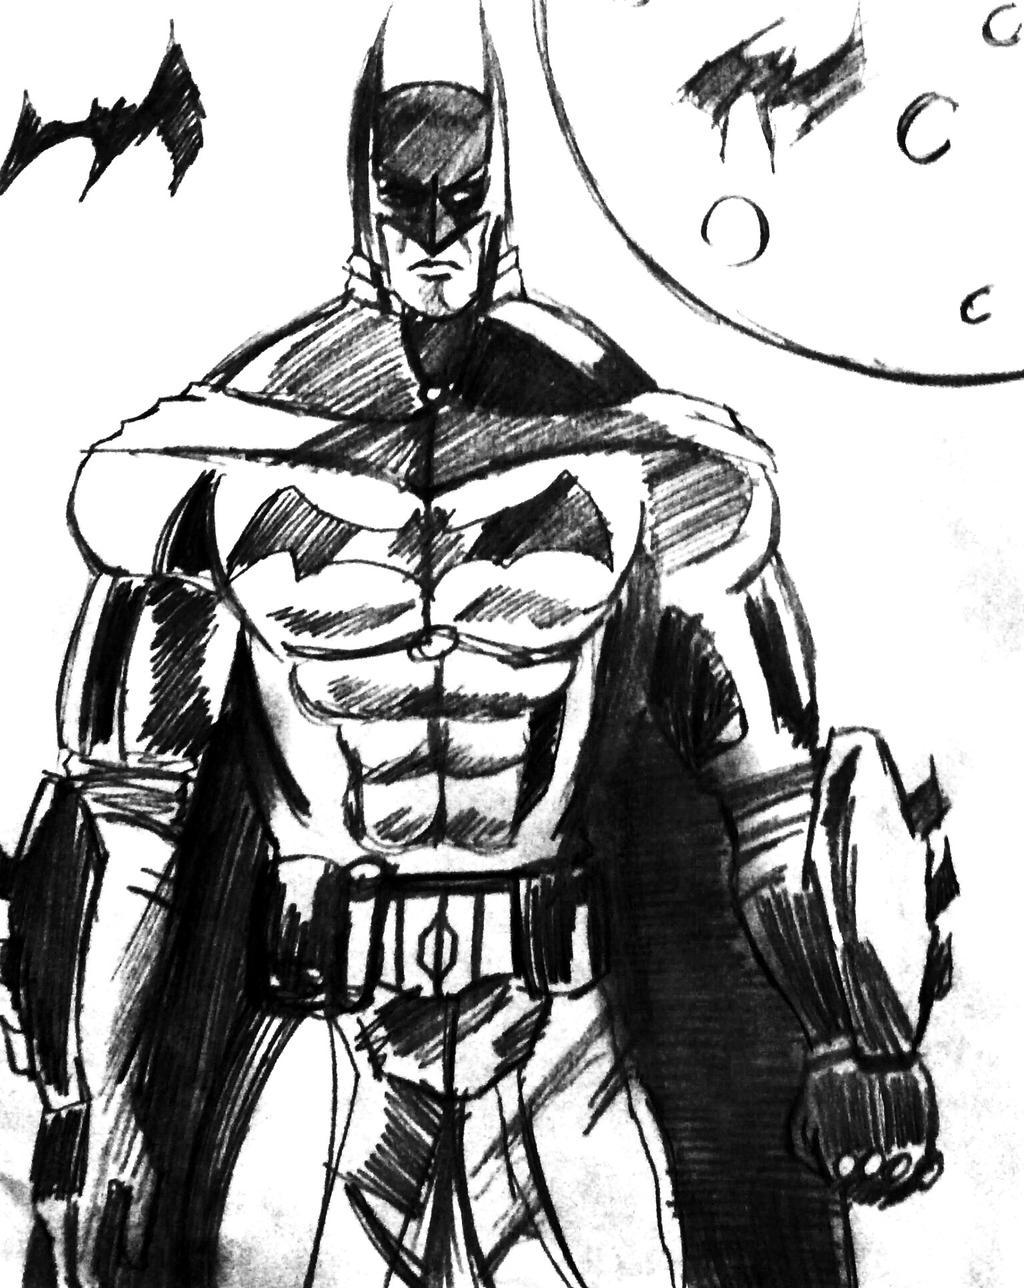 Batman Charcoal Sketch By IsaacVdA On DeviantArt